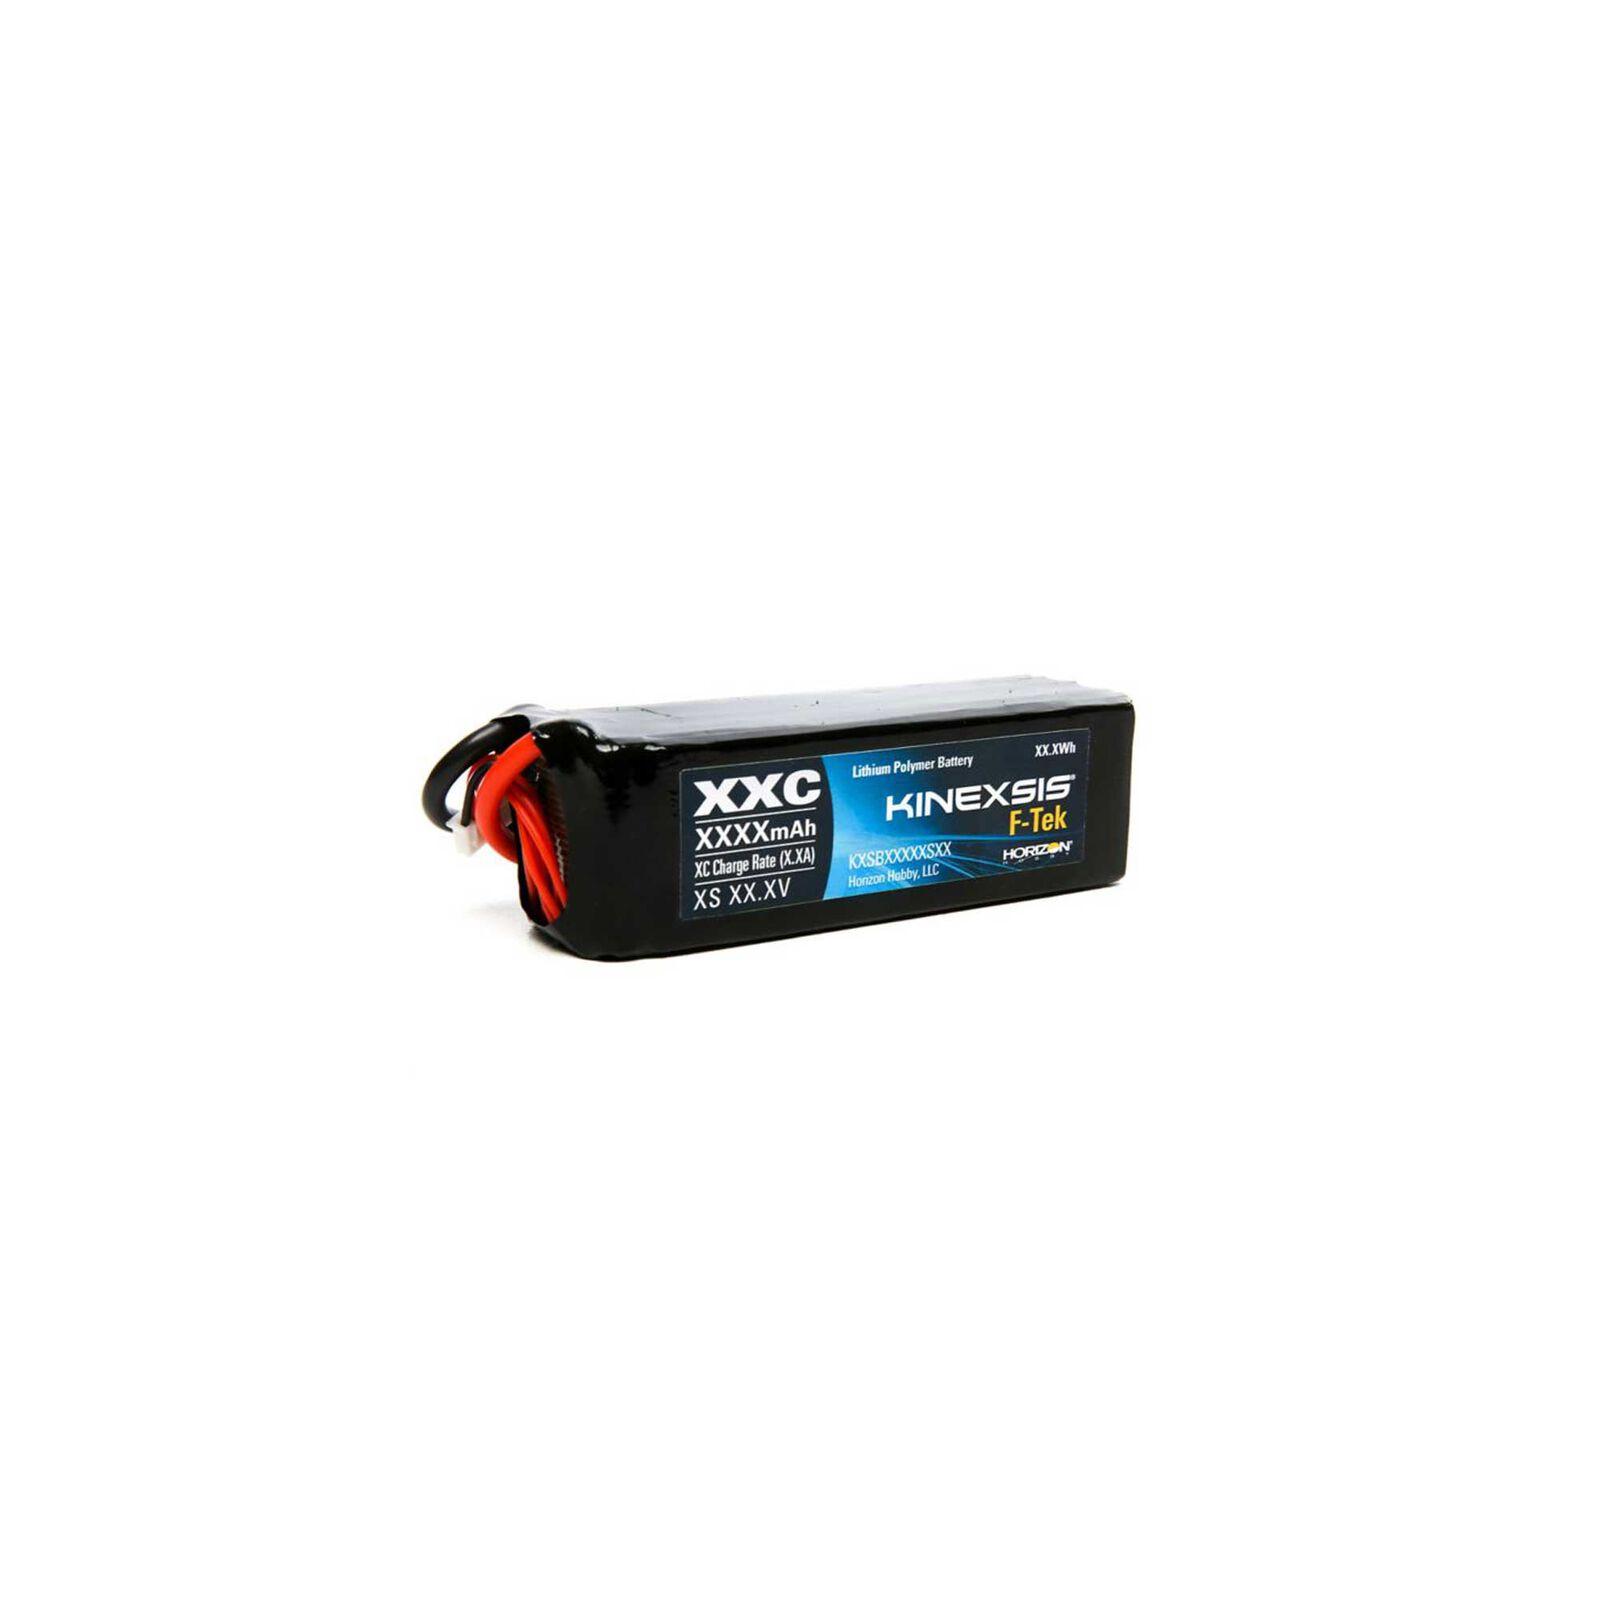 11.1V 5000mAh 3S 30C F-Tek Hardcase LiPo Battery: EC3